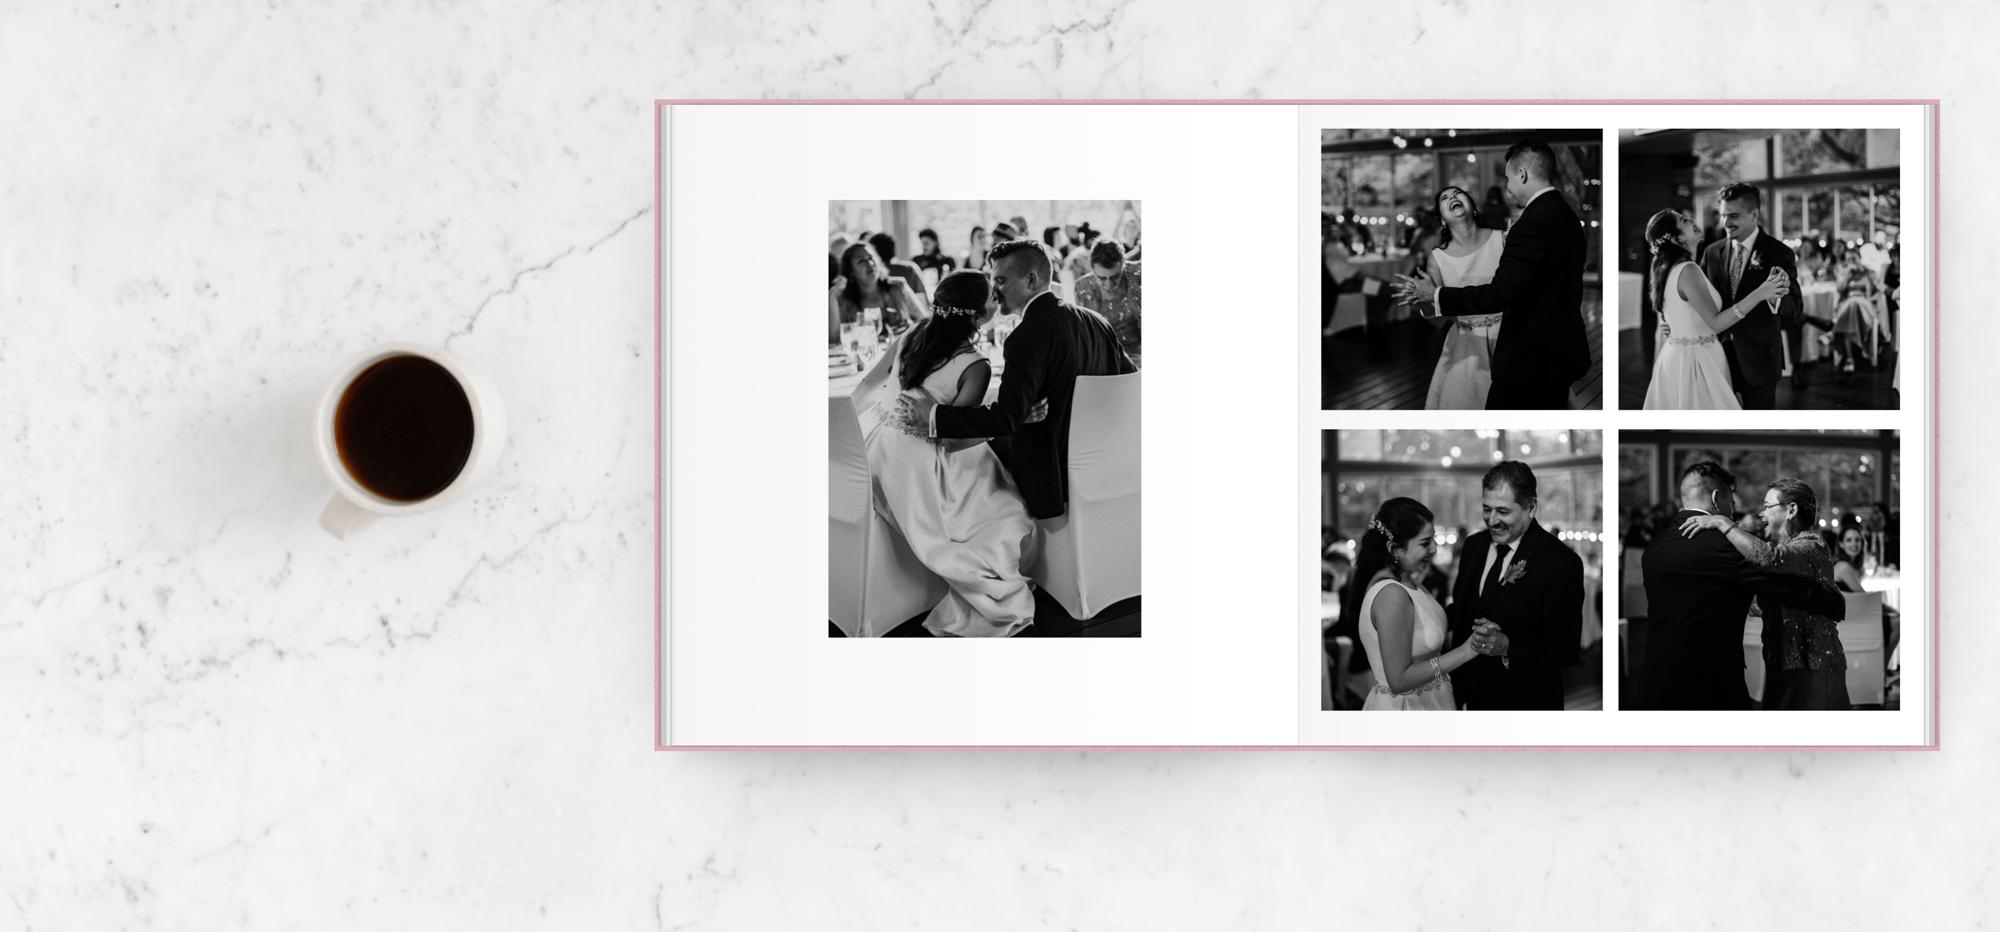 GivernyAlbumAnaMatt_0017.jpg